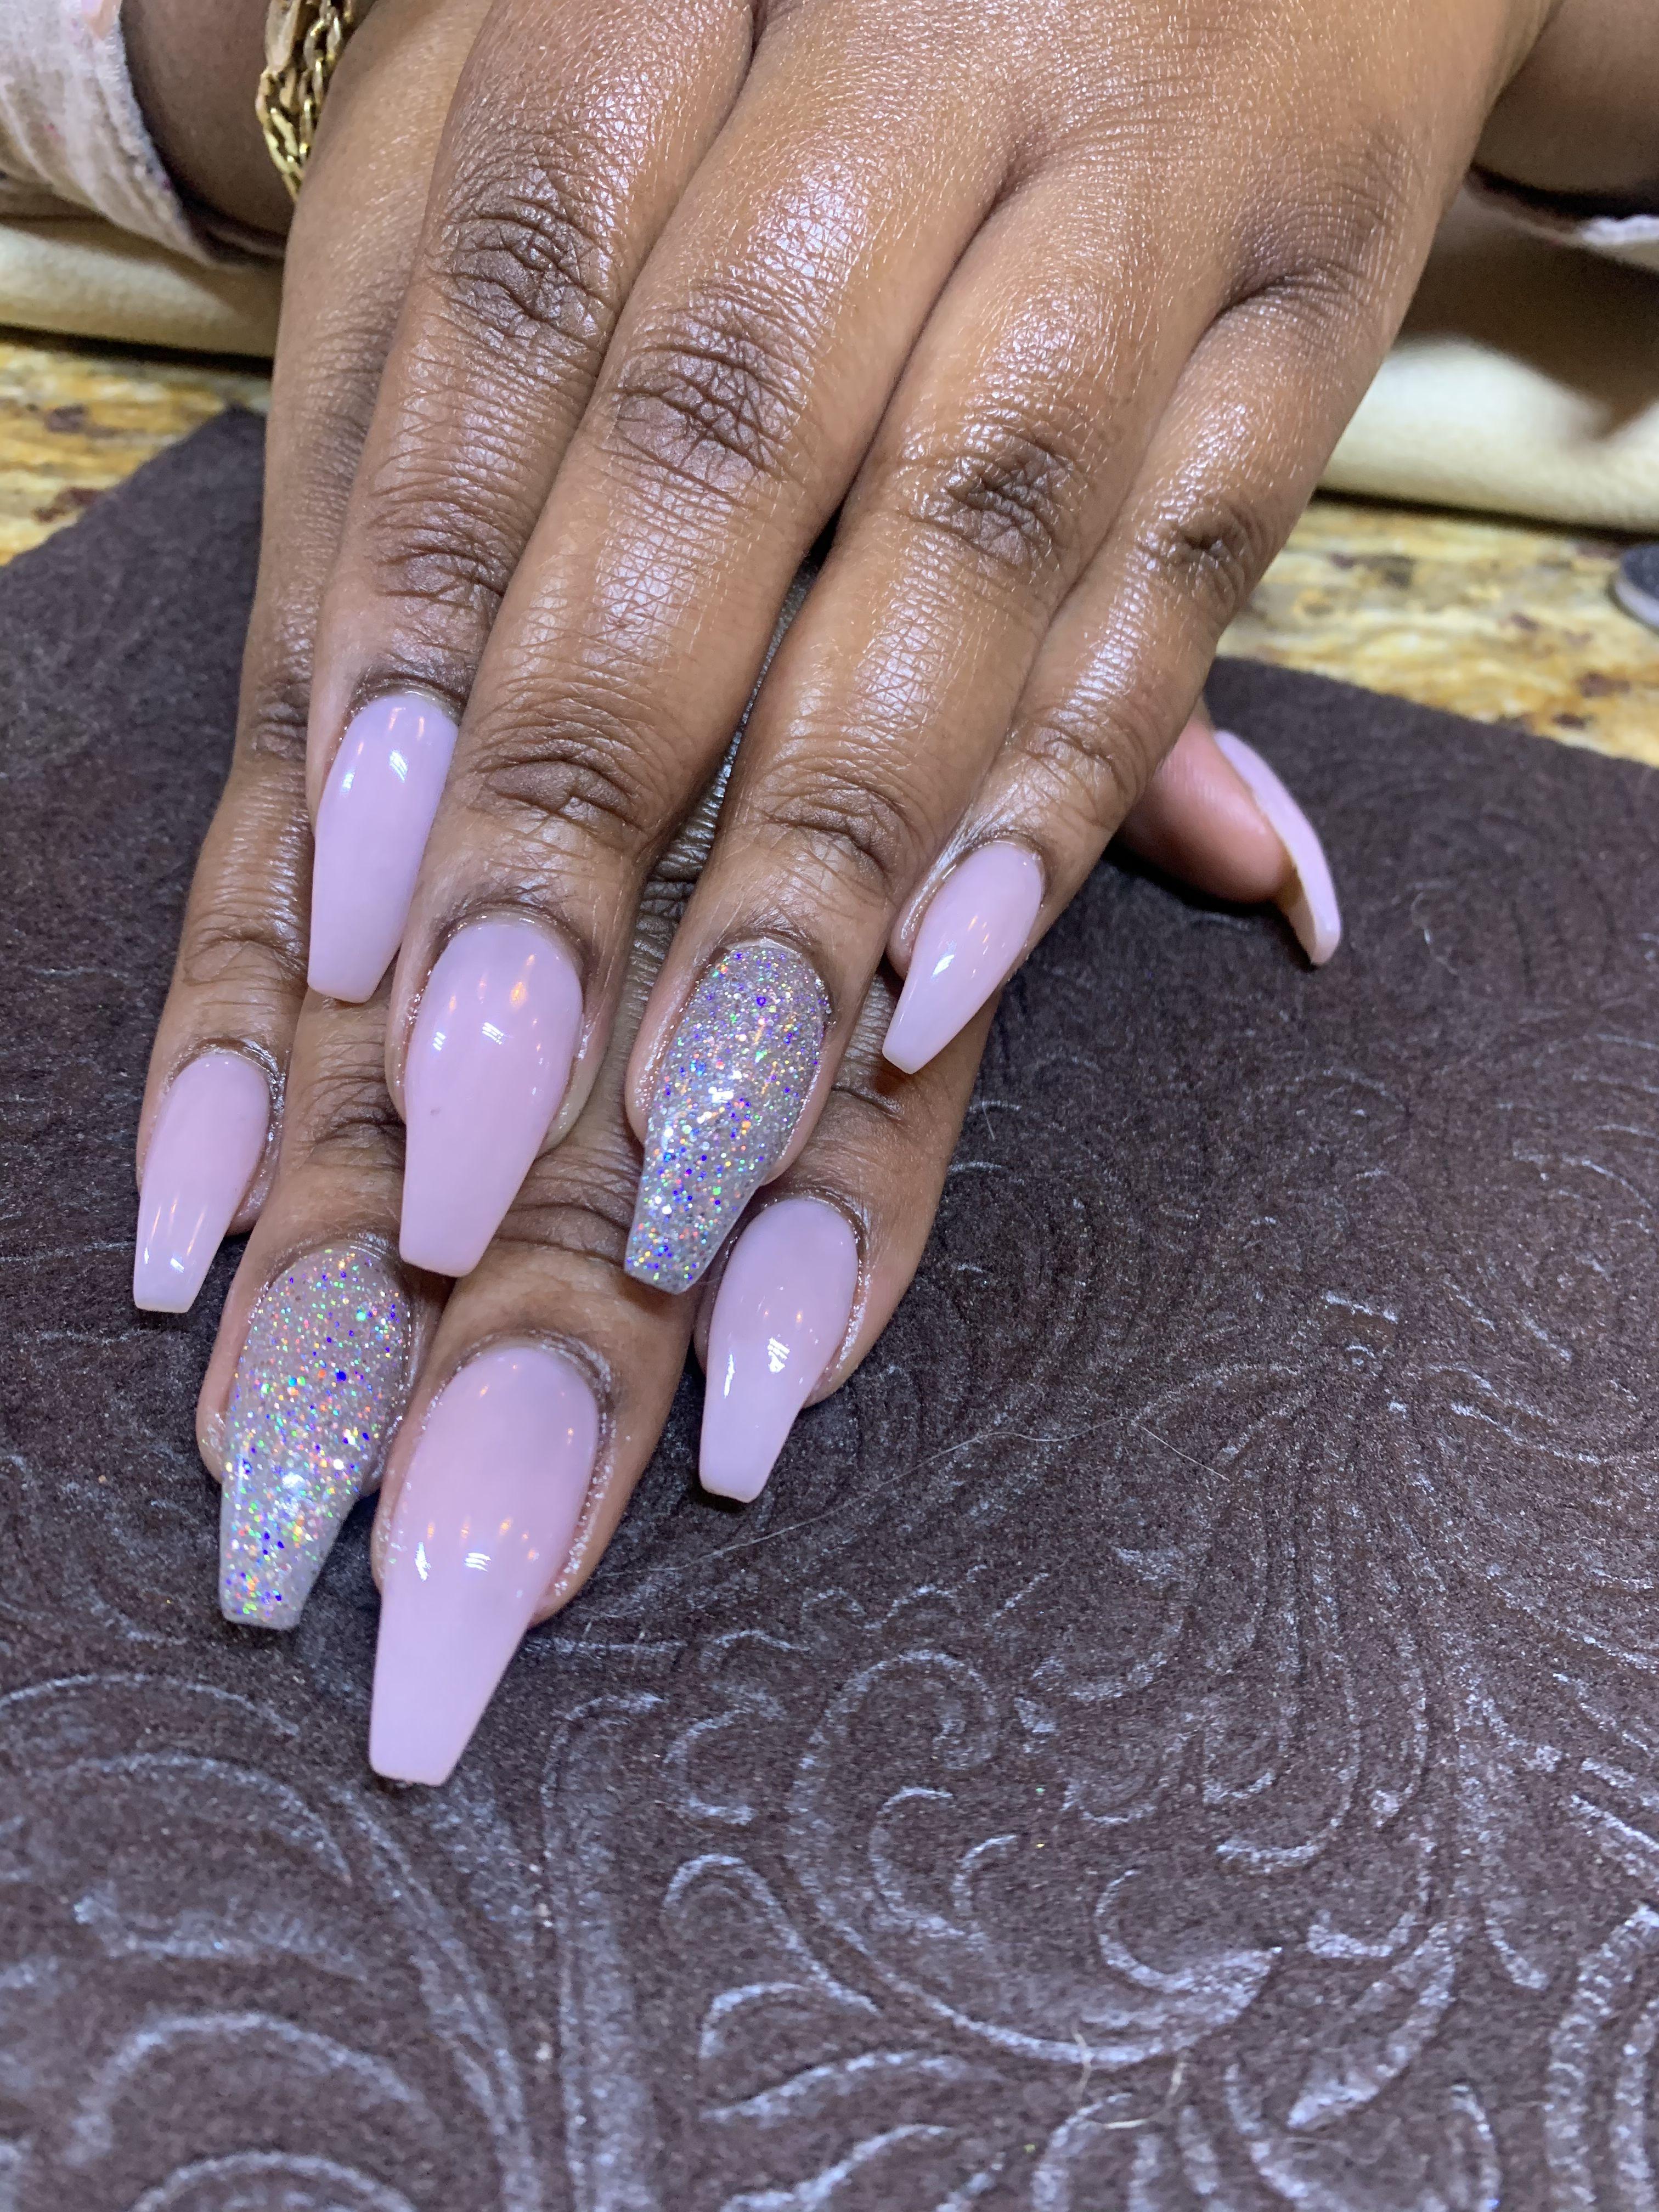 #nails #coffinnails #acrylicnails #glitter #glitternails #nailart #accentnails #pinknails #naildesigns #brownsugarnailspa